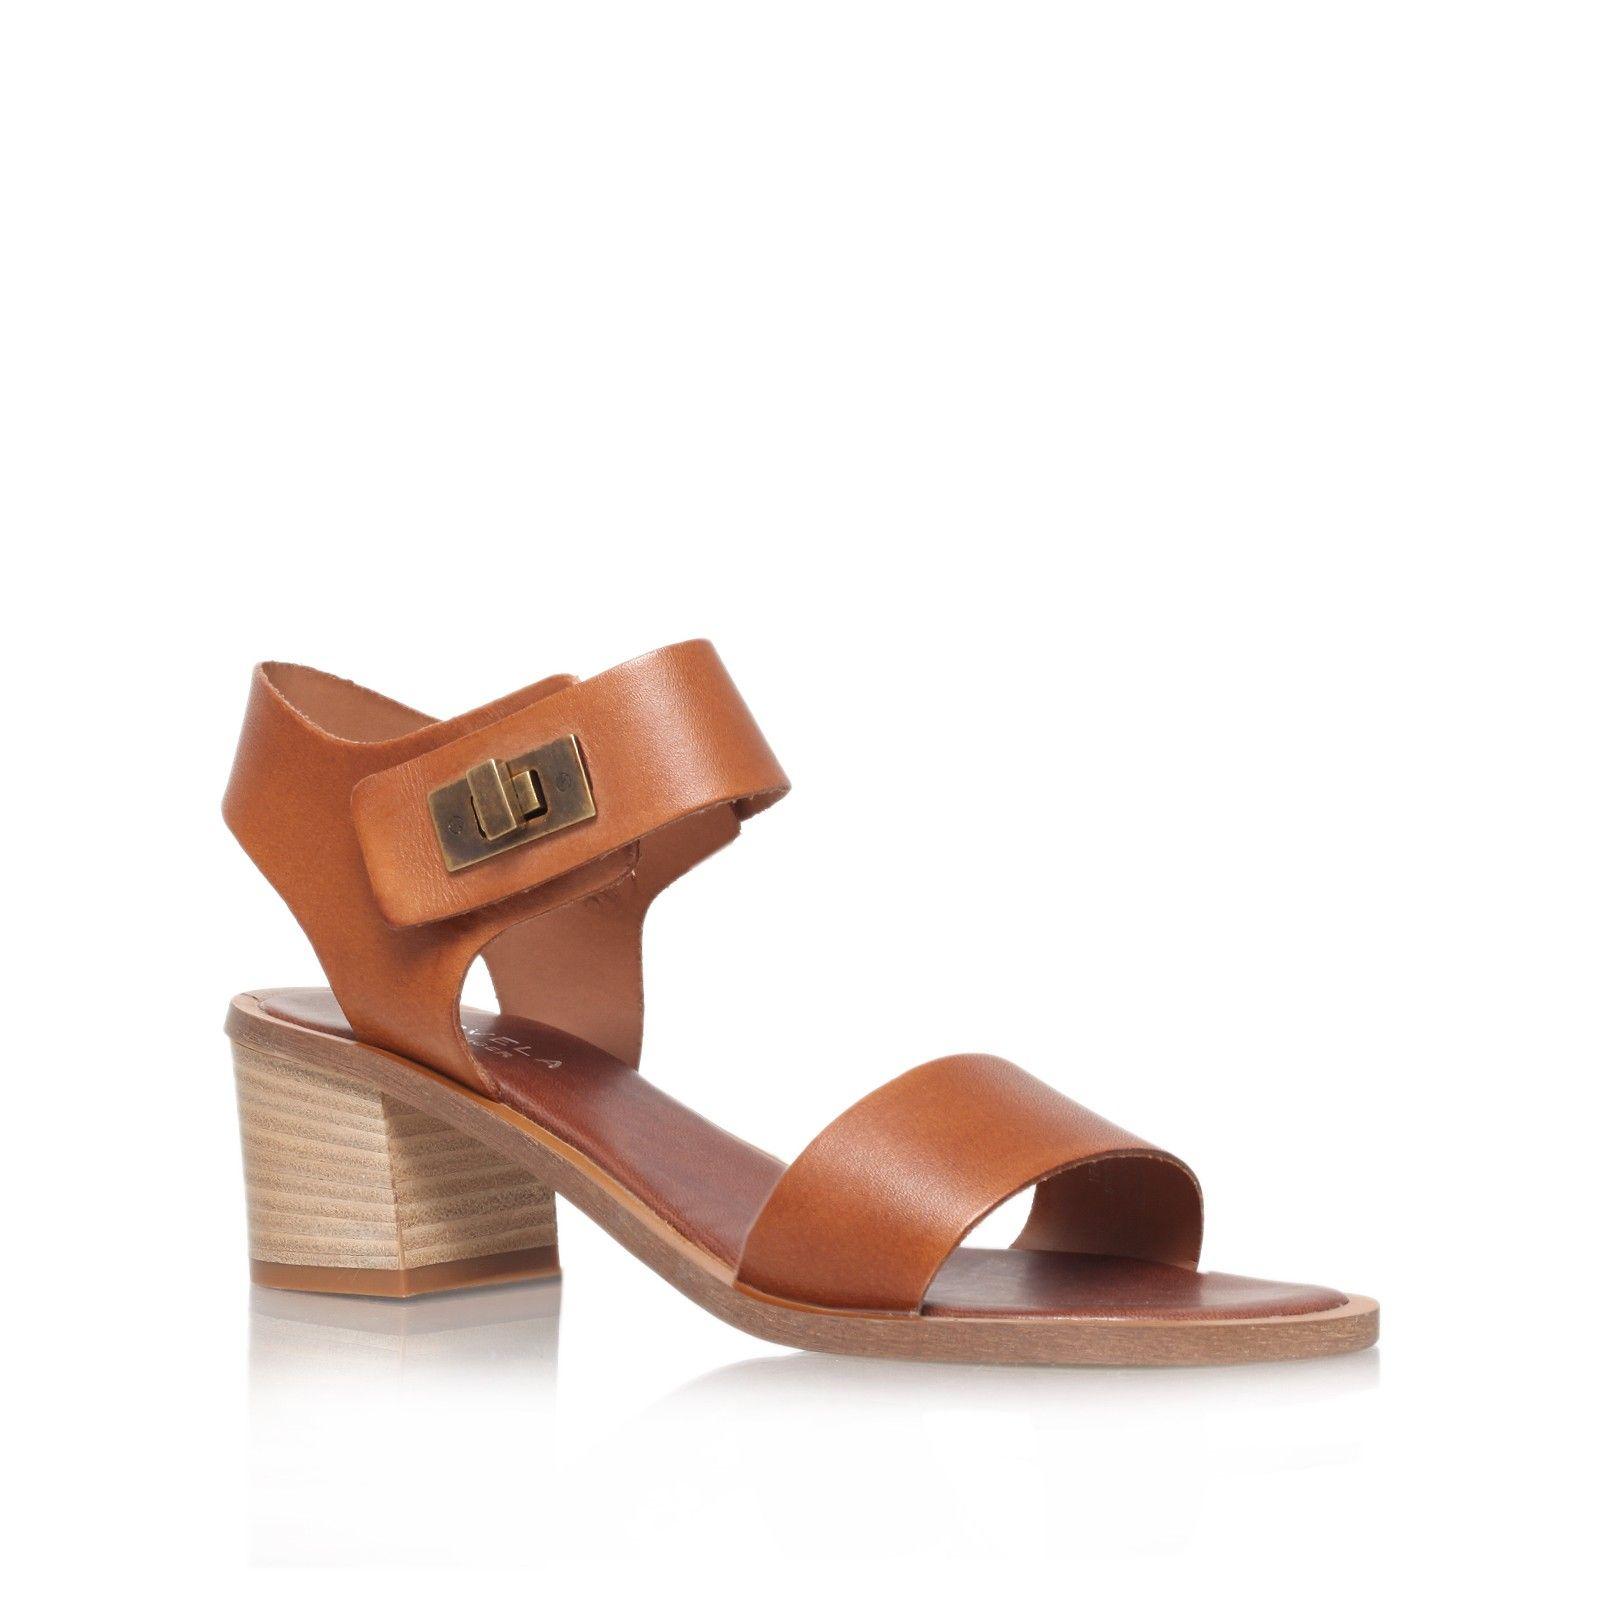 Black sandals debenhams - Kiss Tan Accessory By Carvela Kurt Geiger Women Shoes Sandals